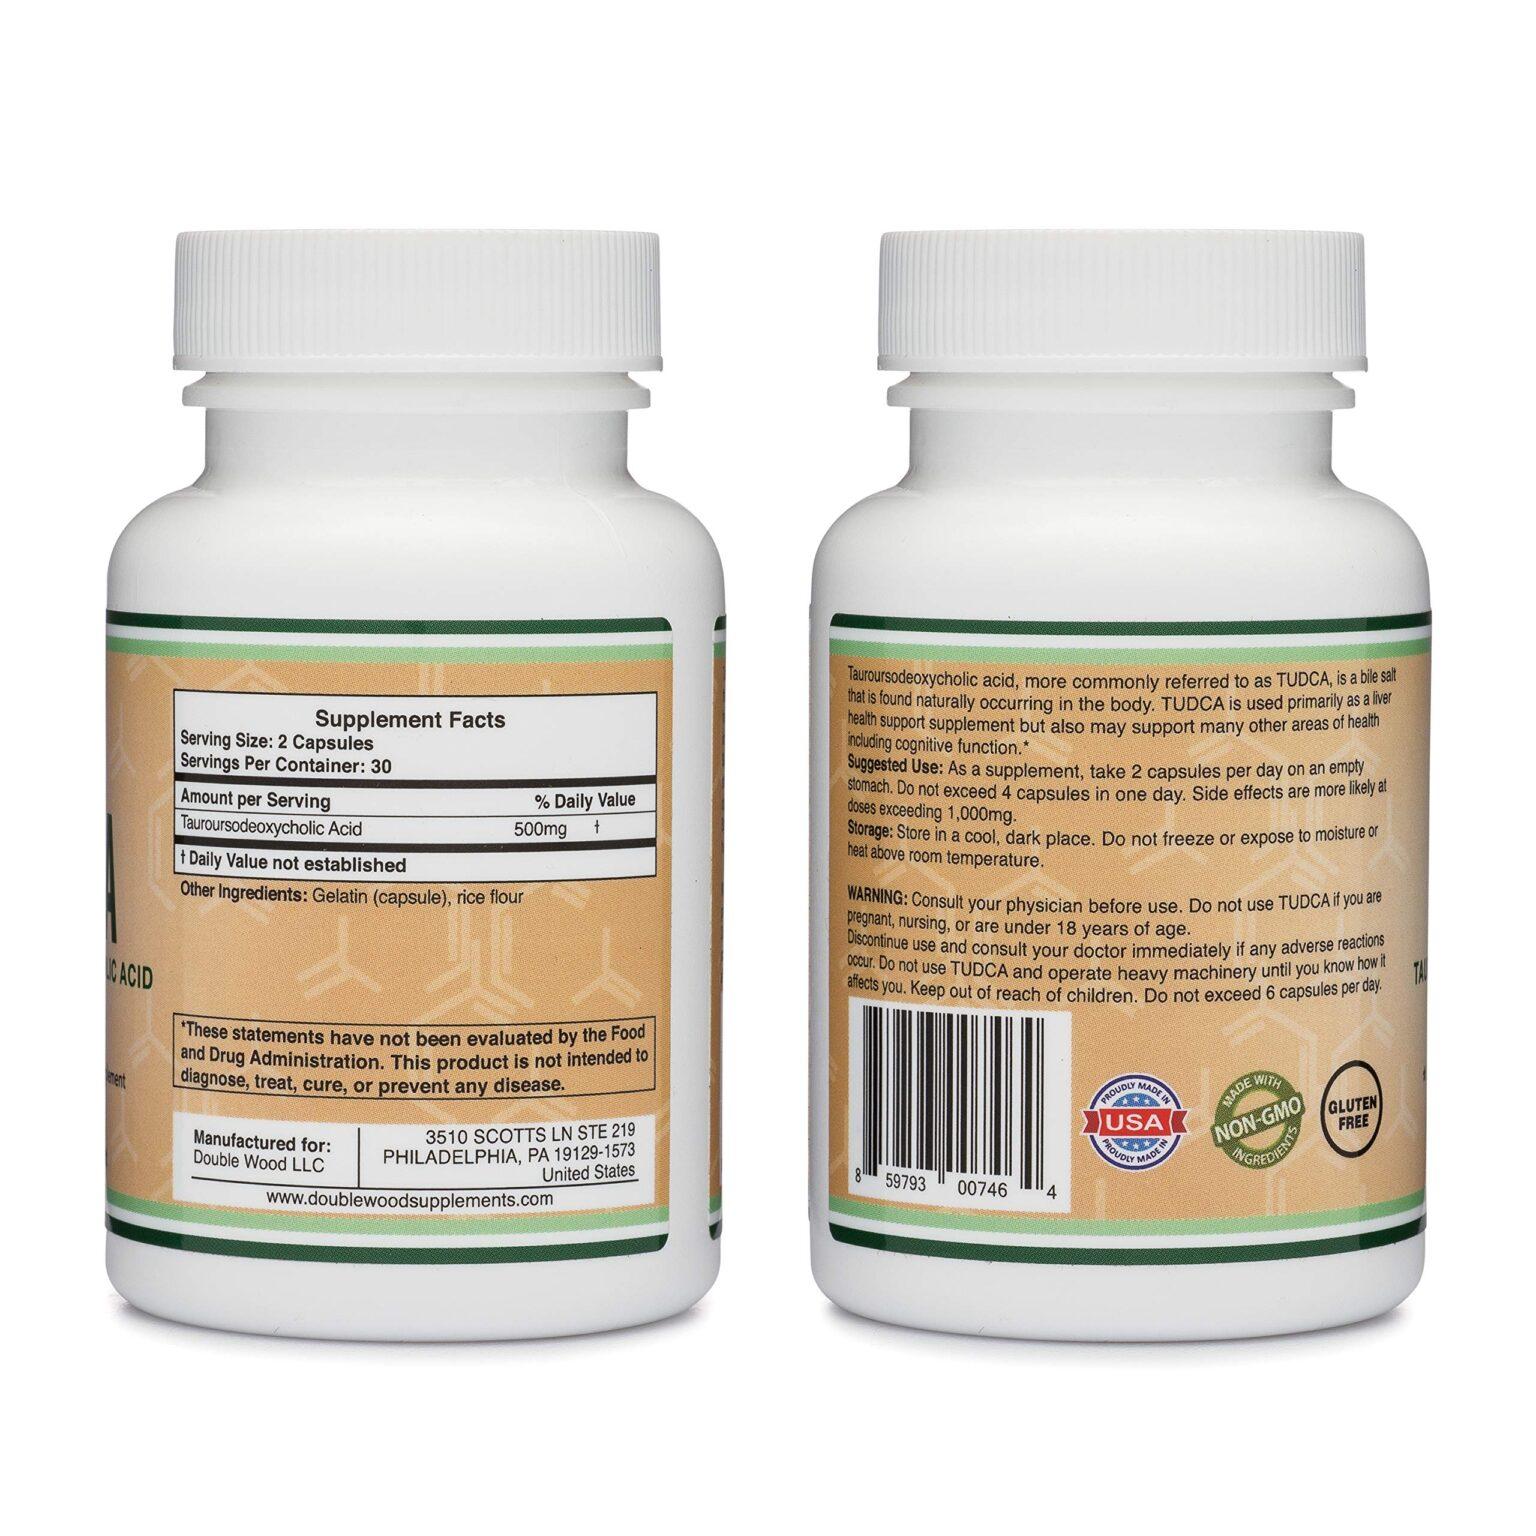 Viên uống Double Wood Supplements TUDCA - Tauroursodeoxycholic Acid 500mg